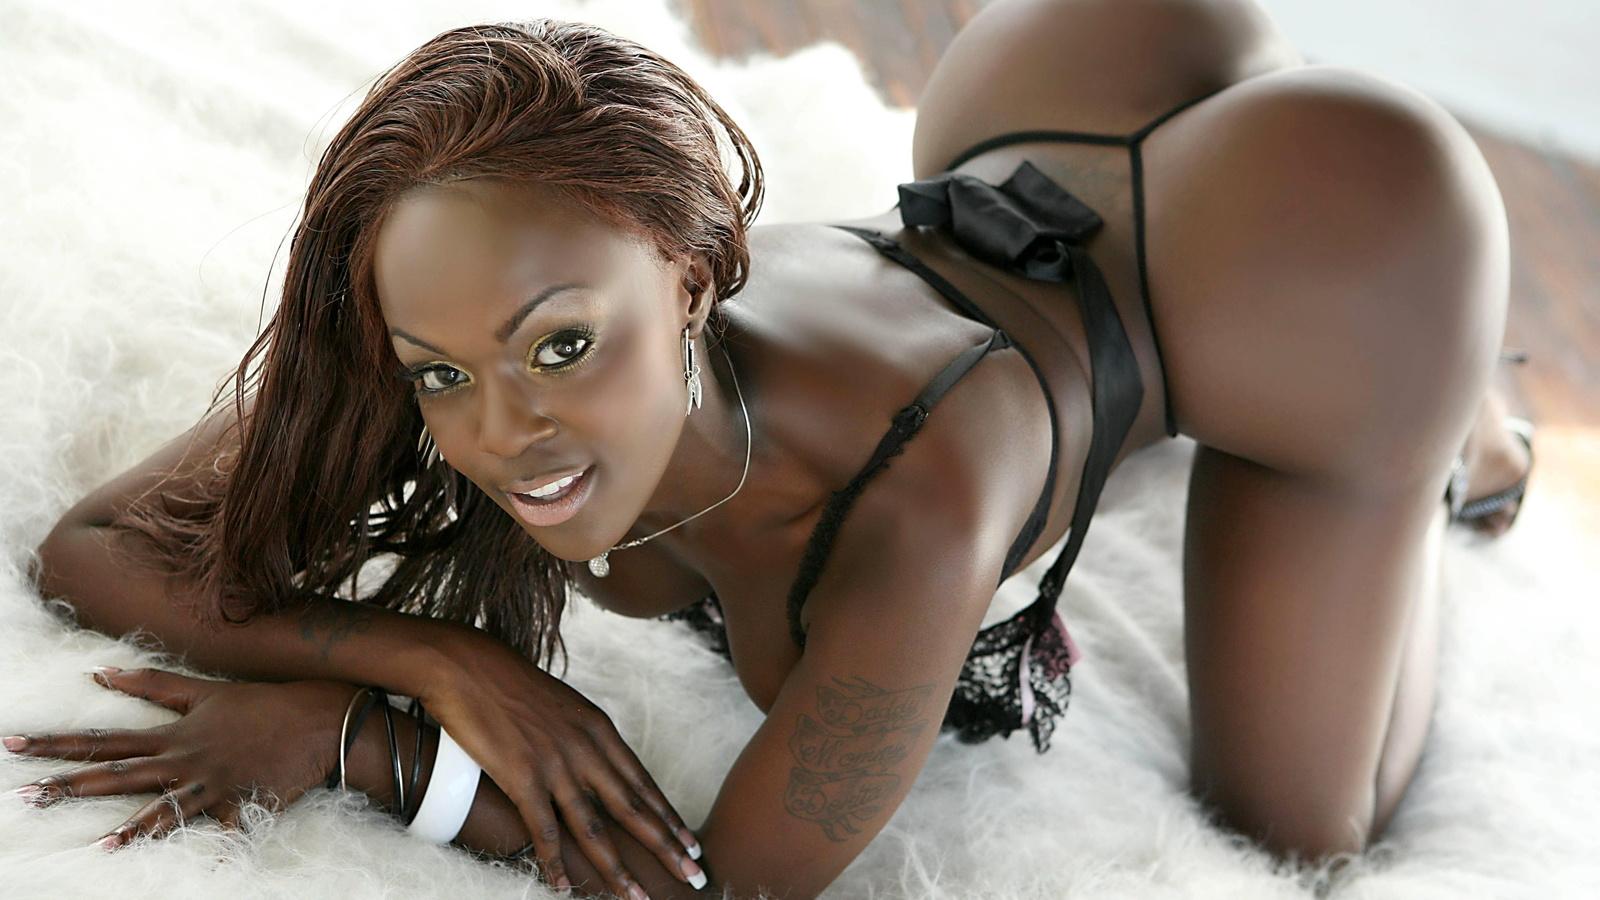 nigerian-girl-erotic-photography